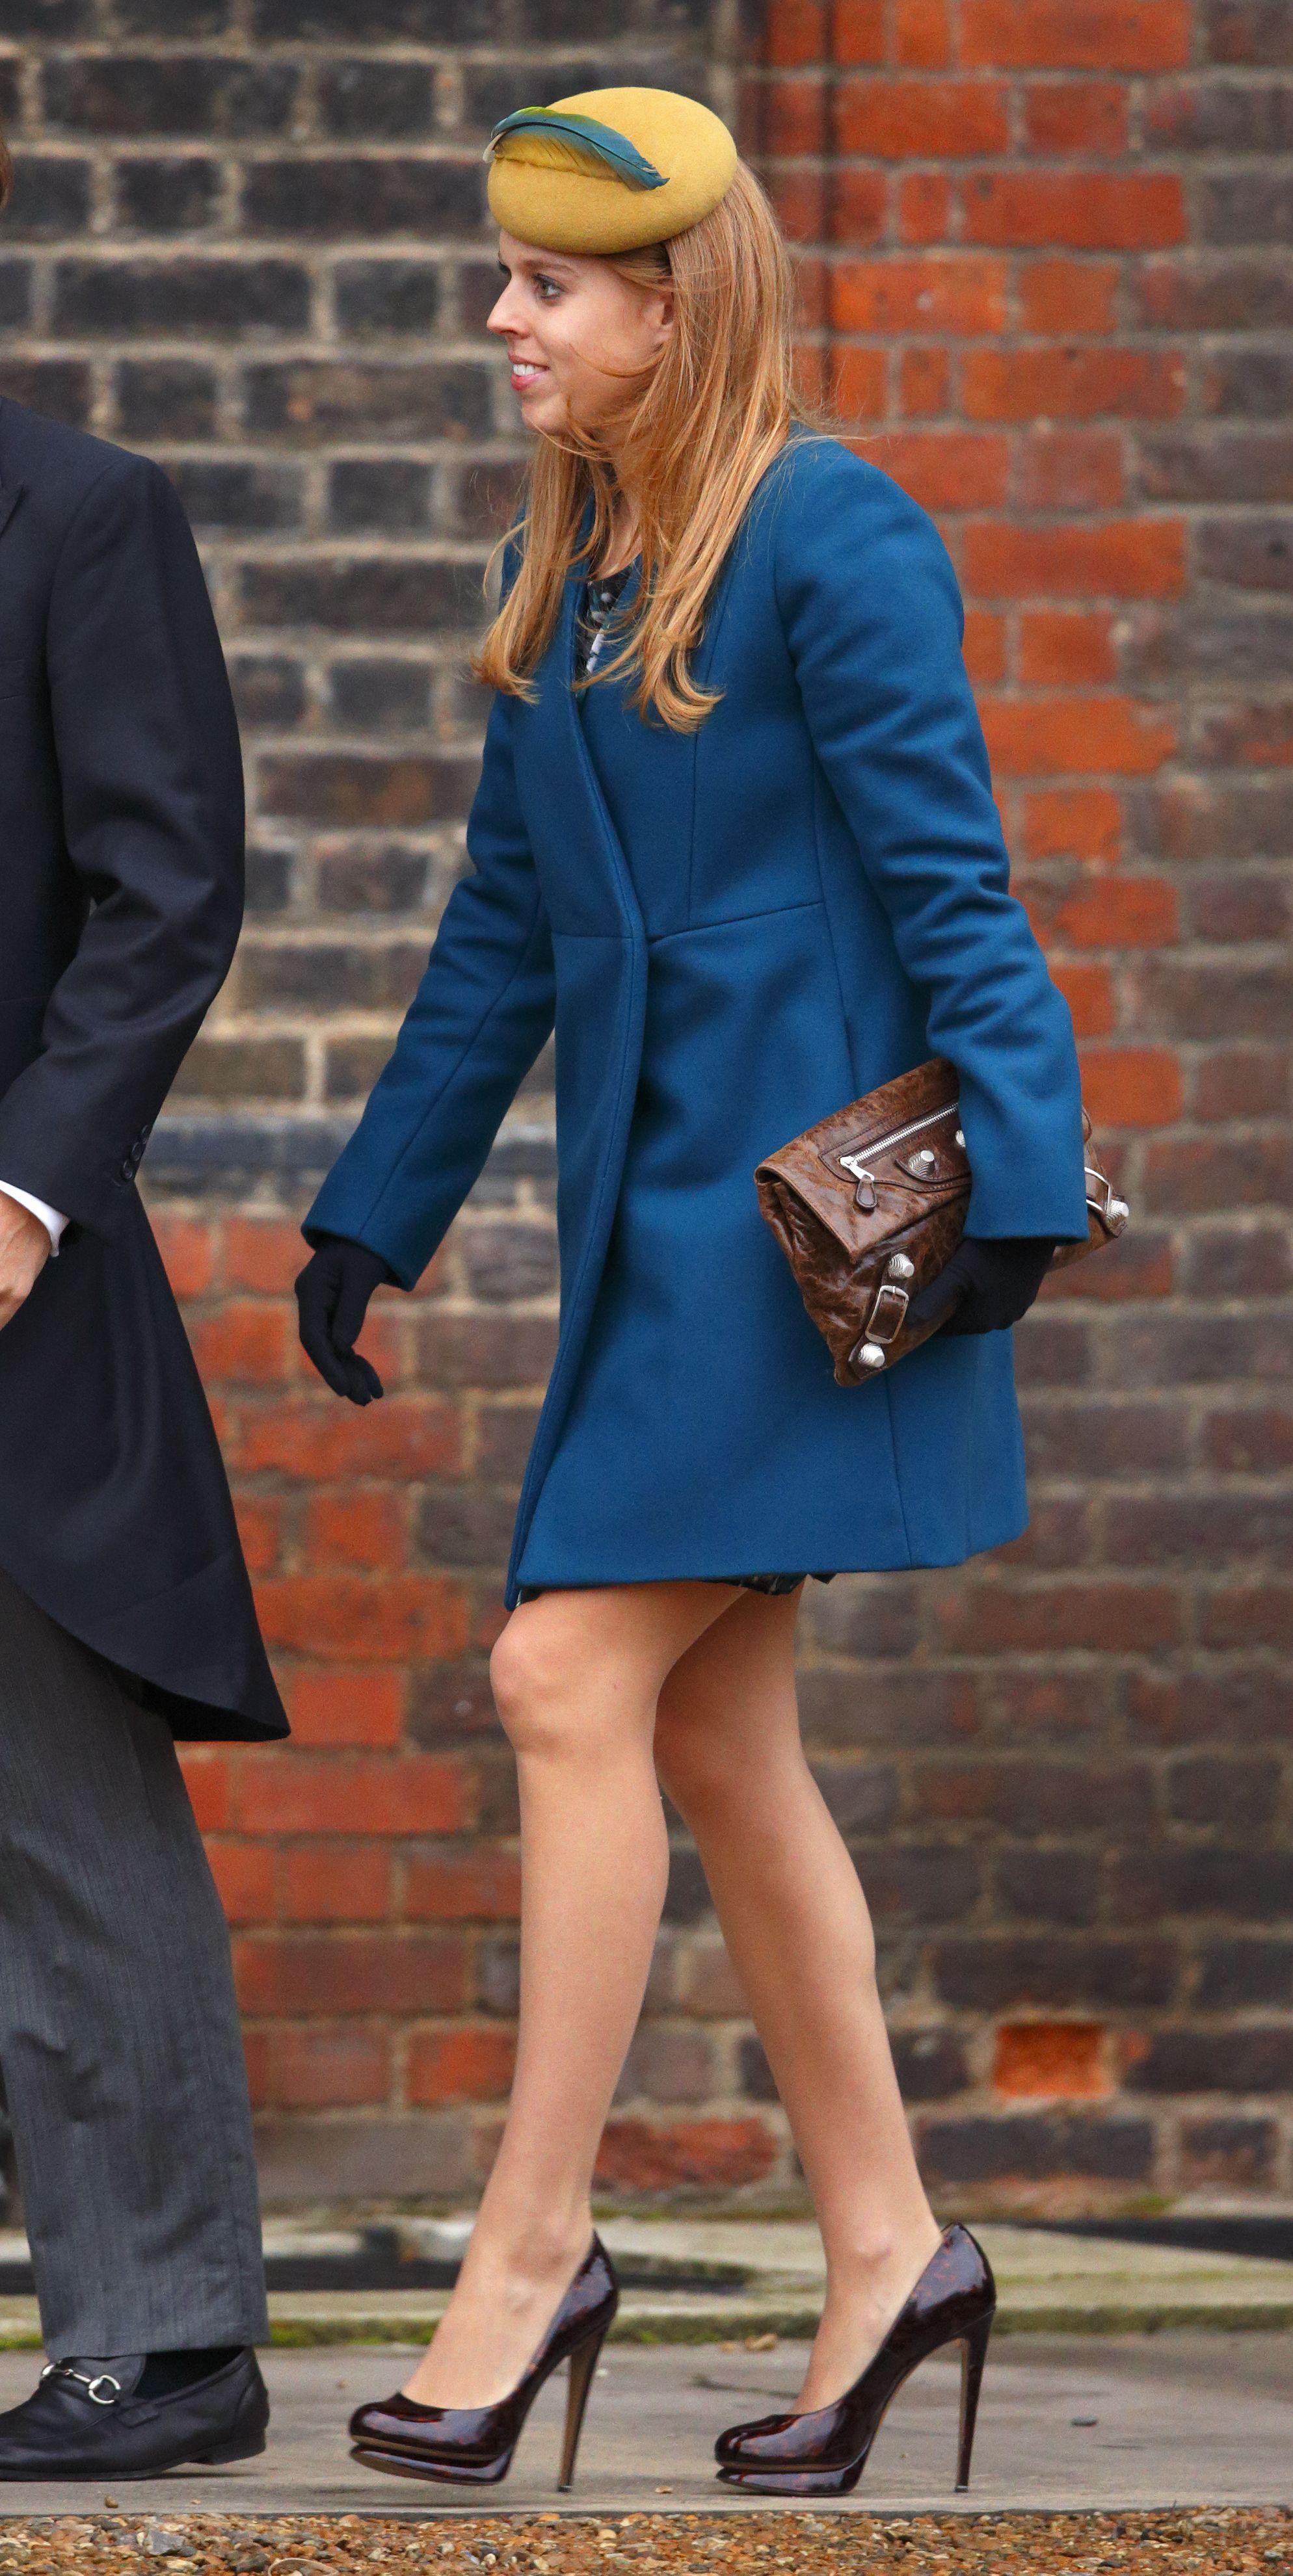 Who Needs a Tiara? Prince Harry's Girlfriend Wears a Crown